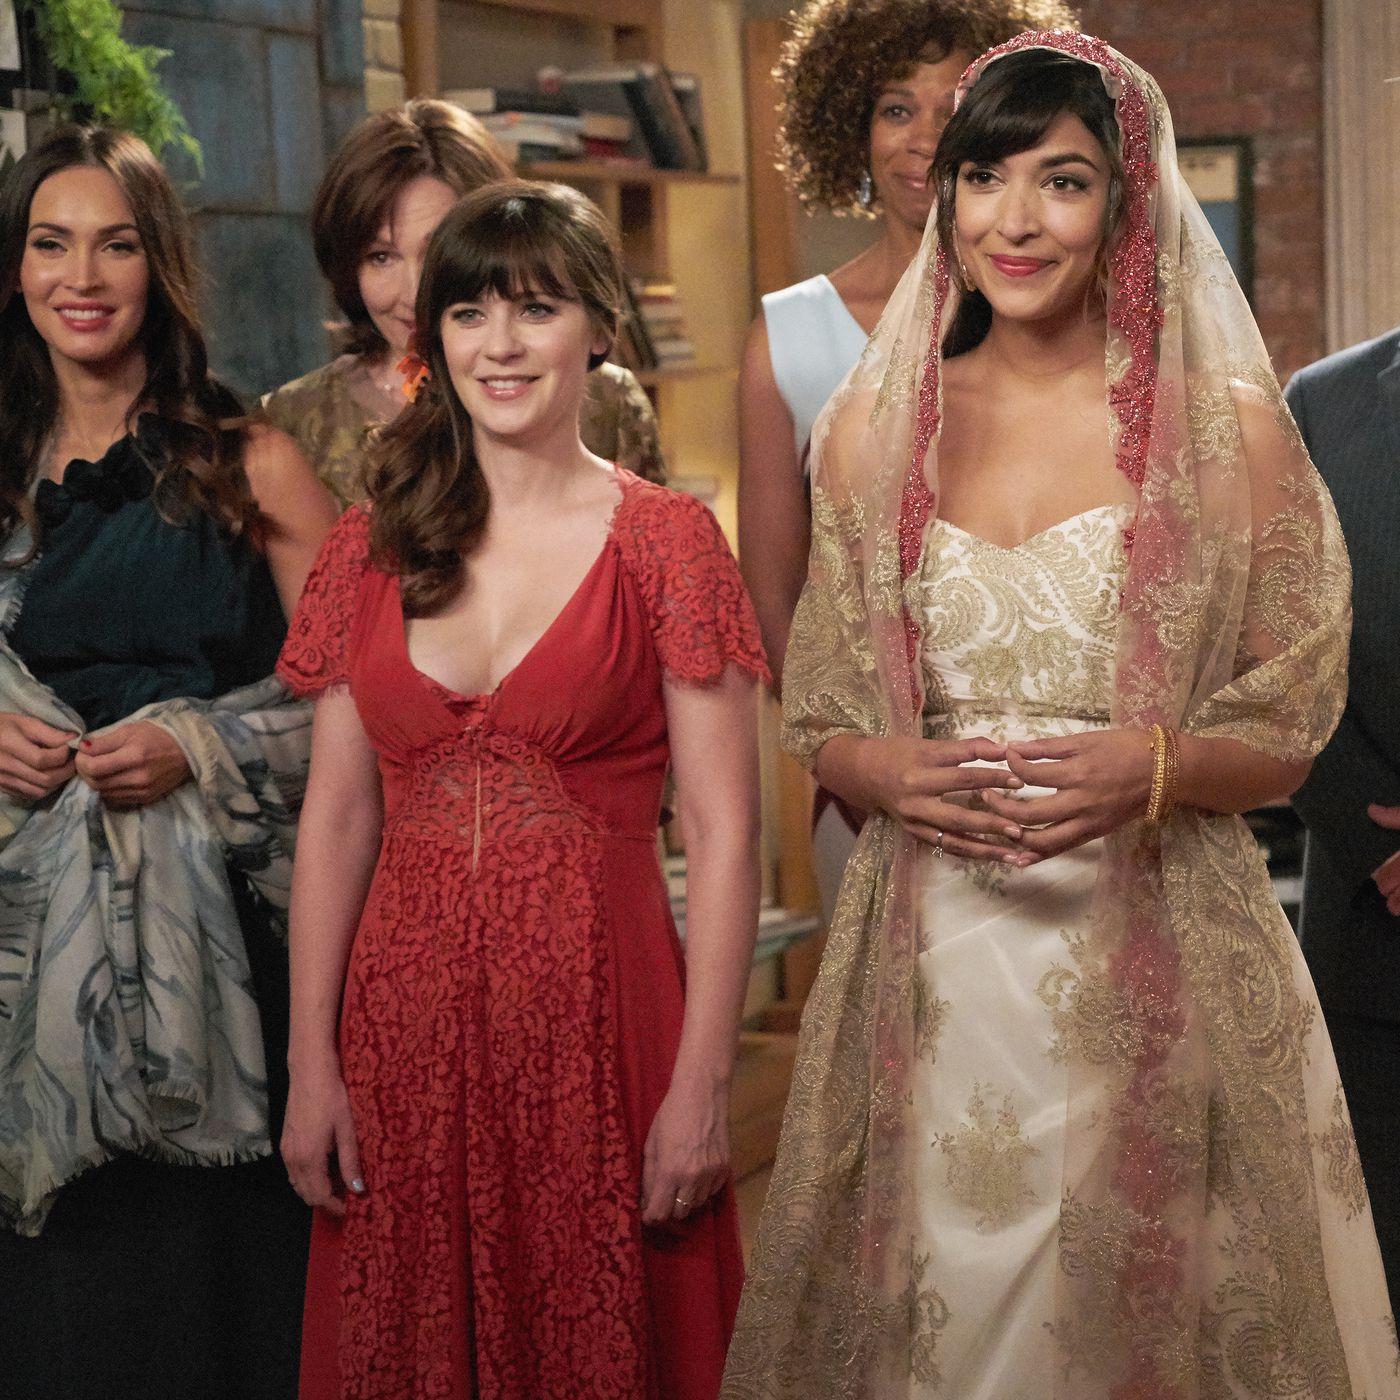 Zoey Dechanel Amazing Tulle Gown Wedding Dresses Used Wedding